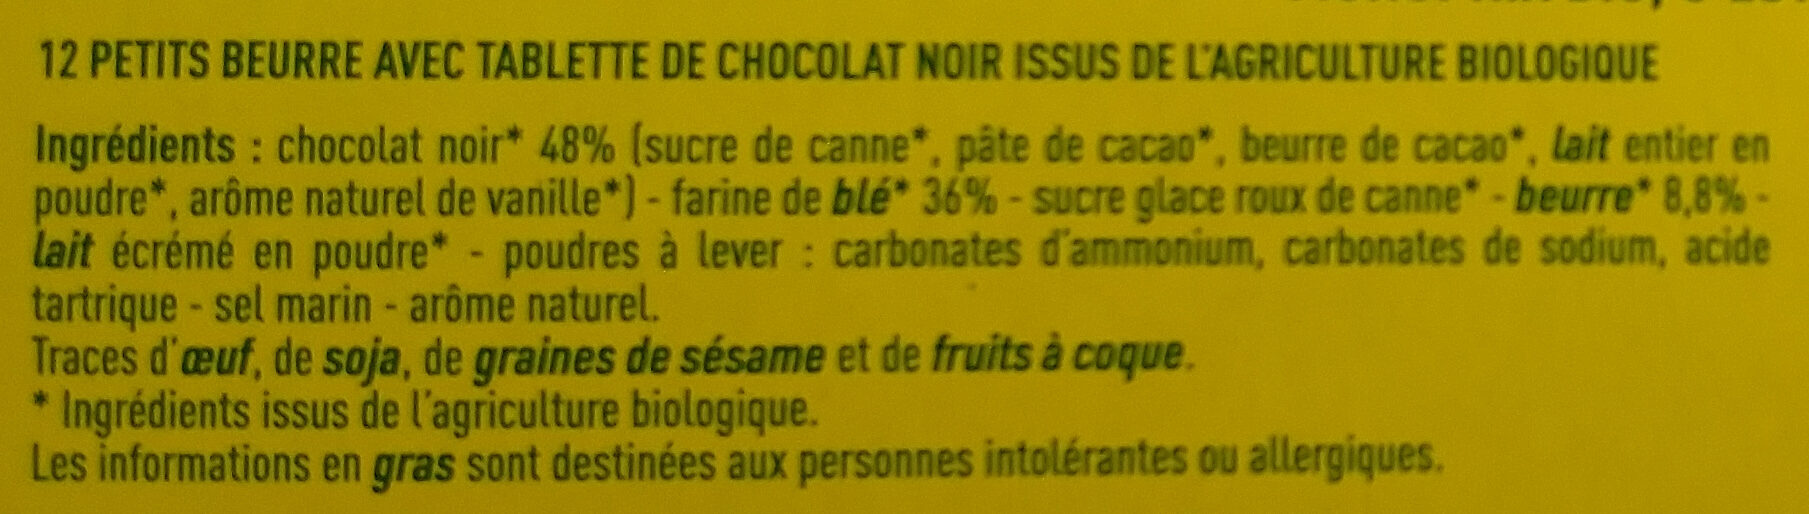 Petit beurre Au chocolat noir - 成分 - fr